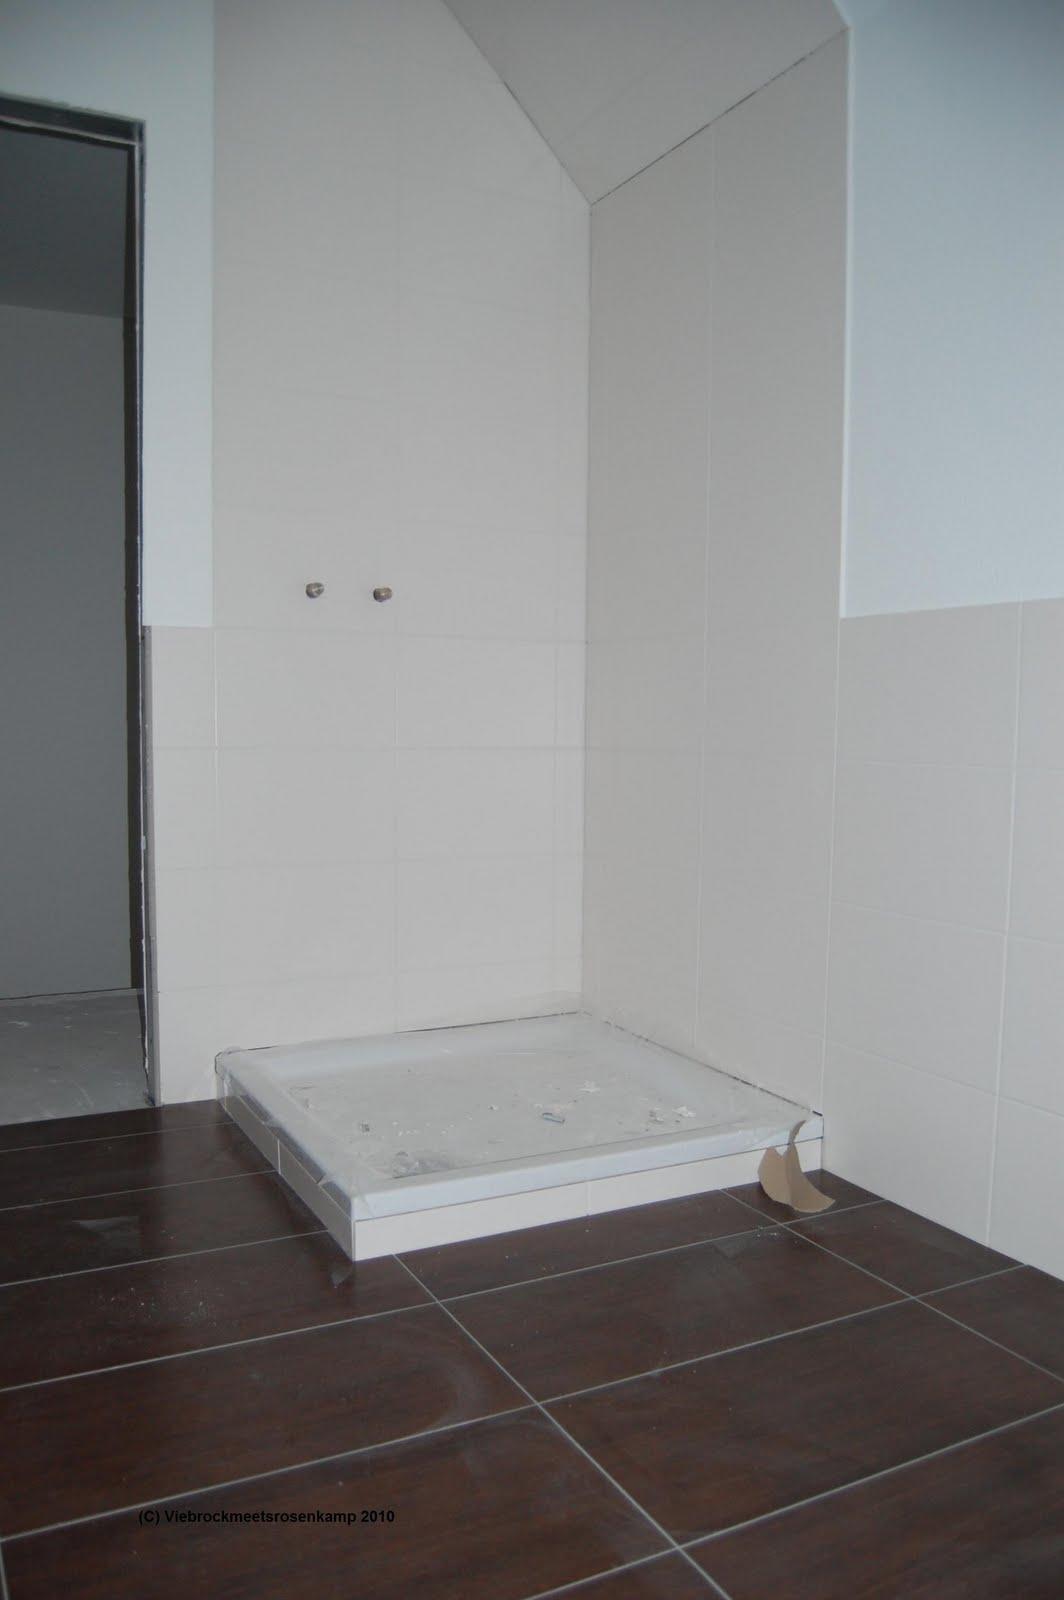 viebrock meets rosenkamp. Black Bedroom Furniture Sets. Home Design Ideas